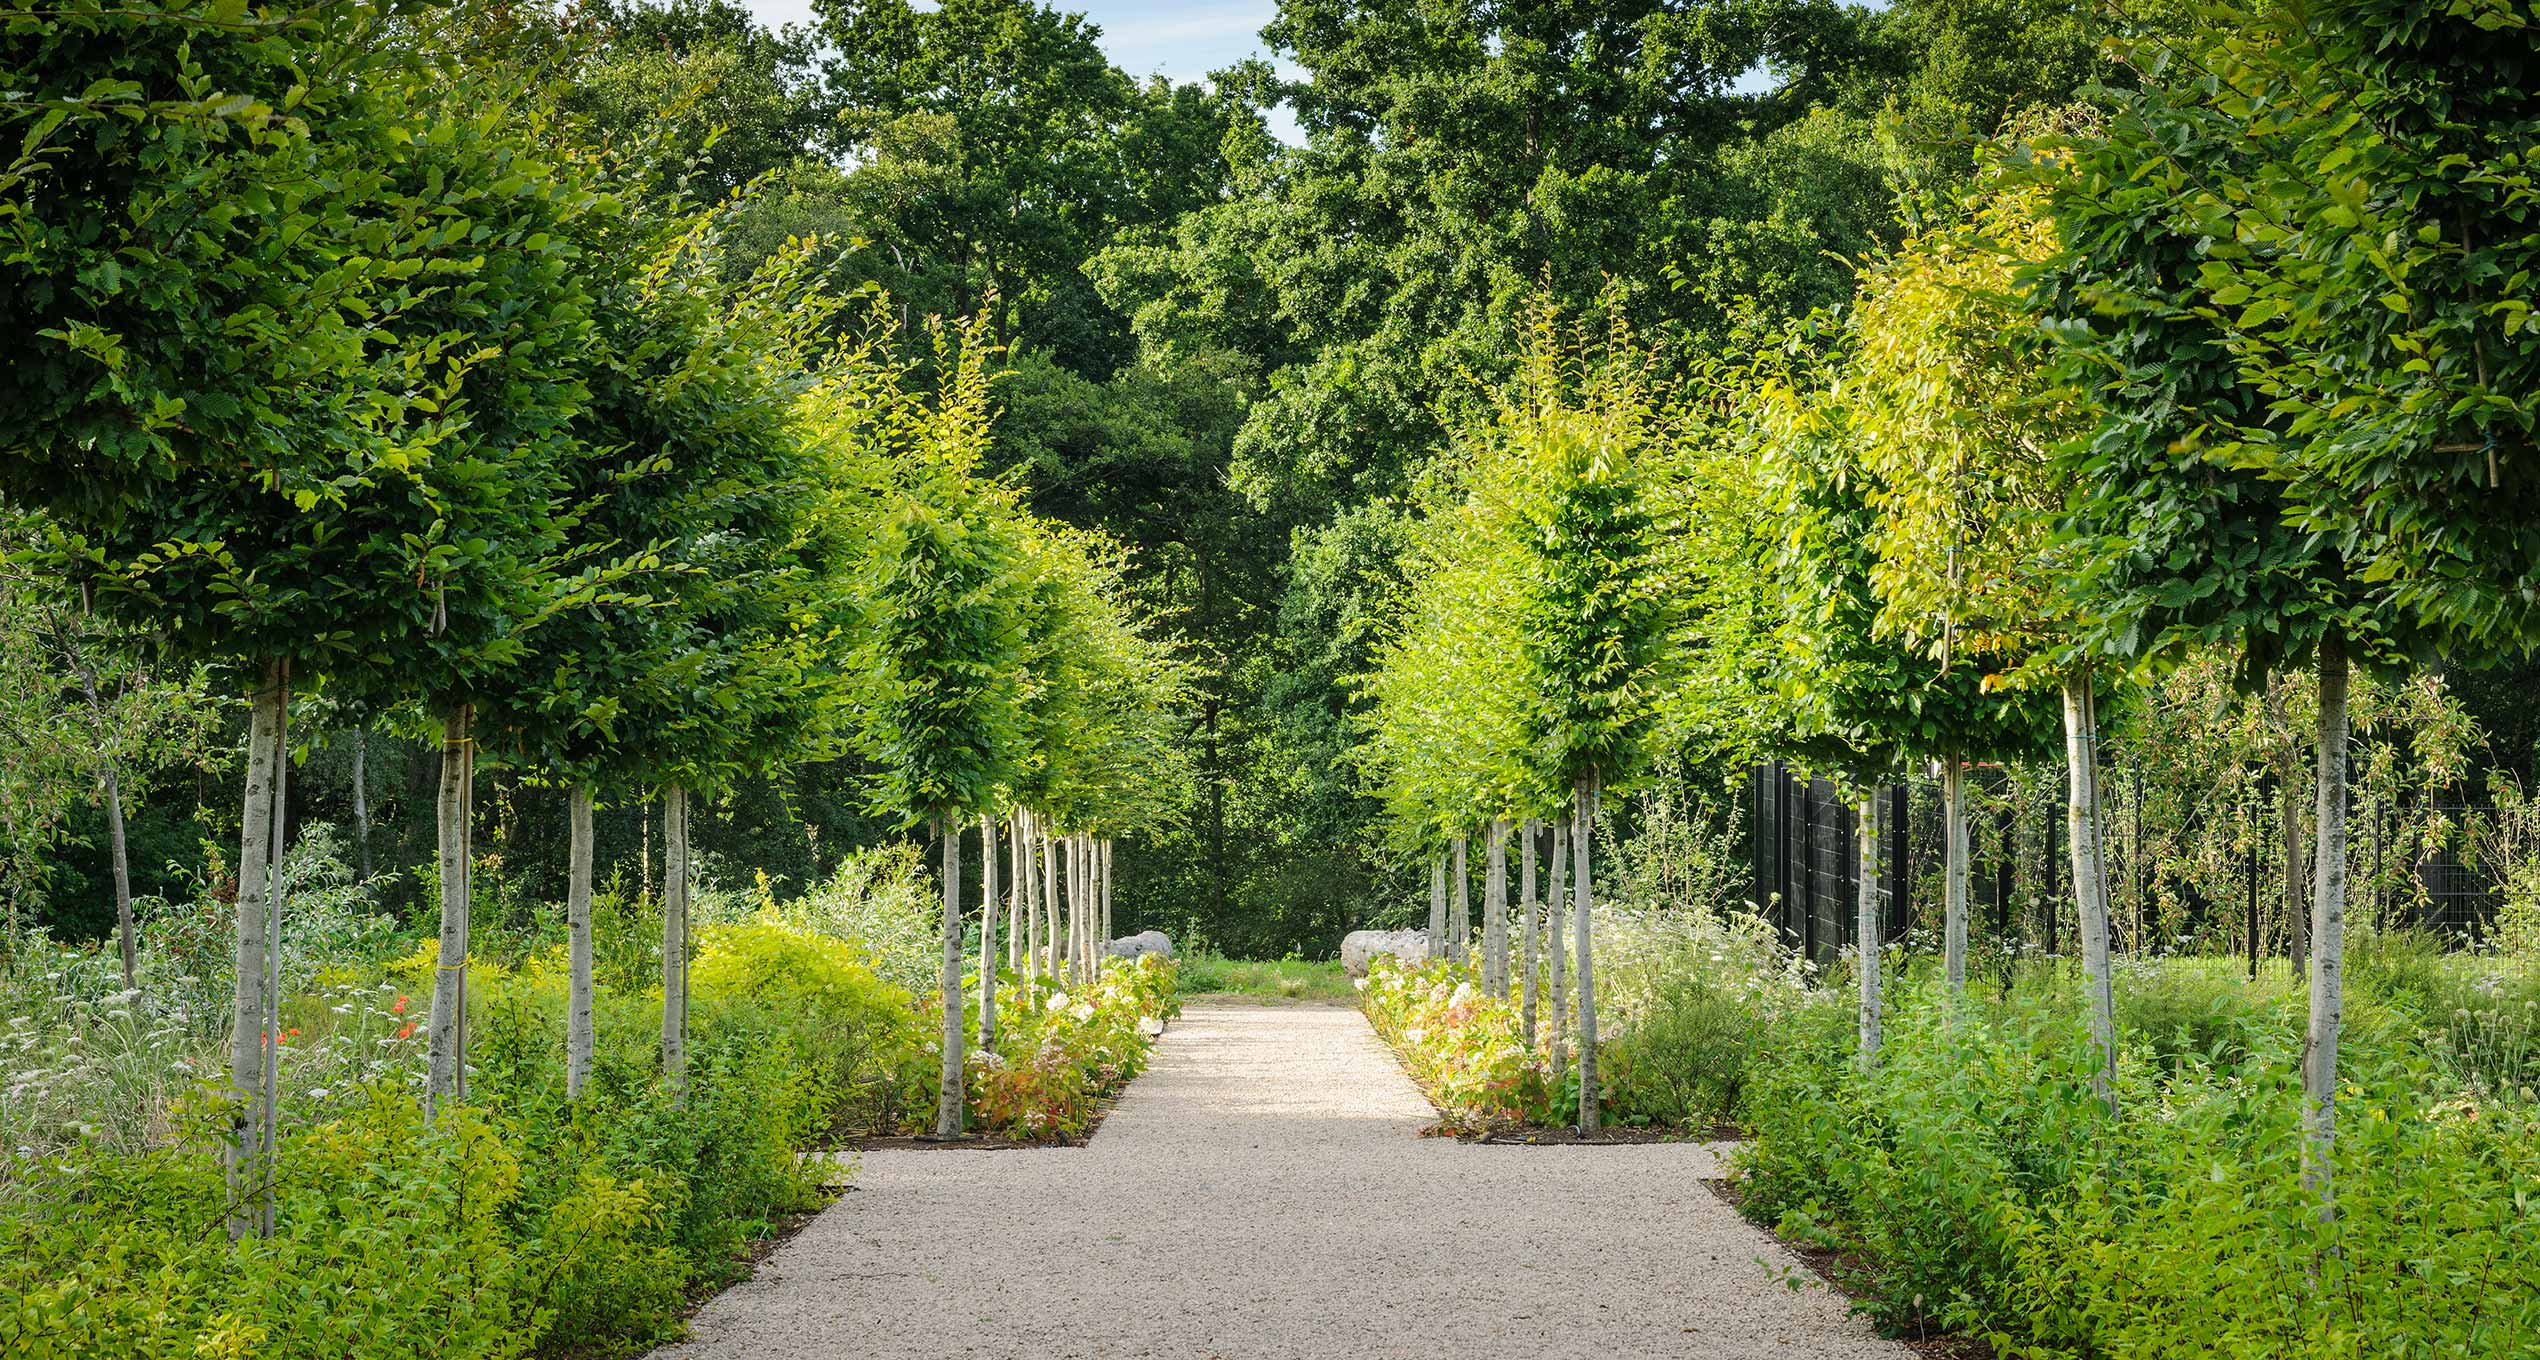 Professional Landscape Architects